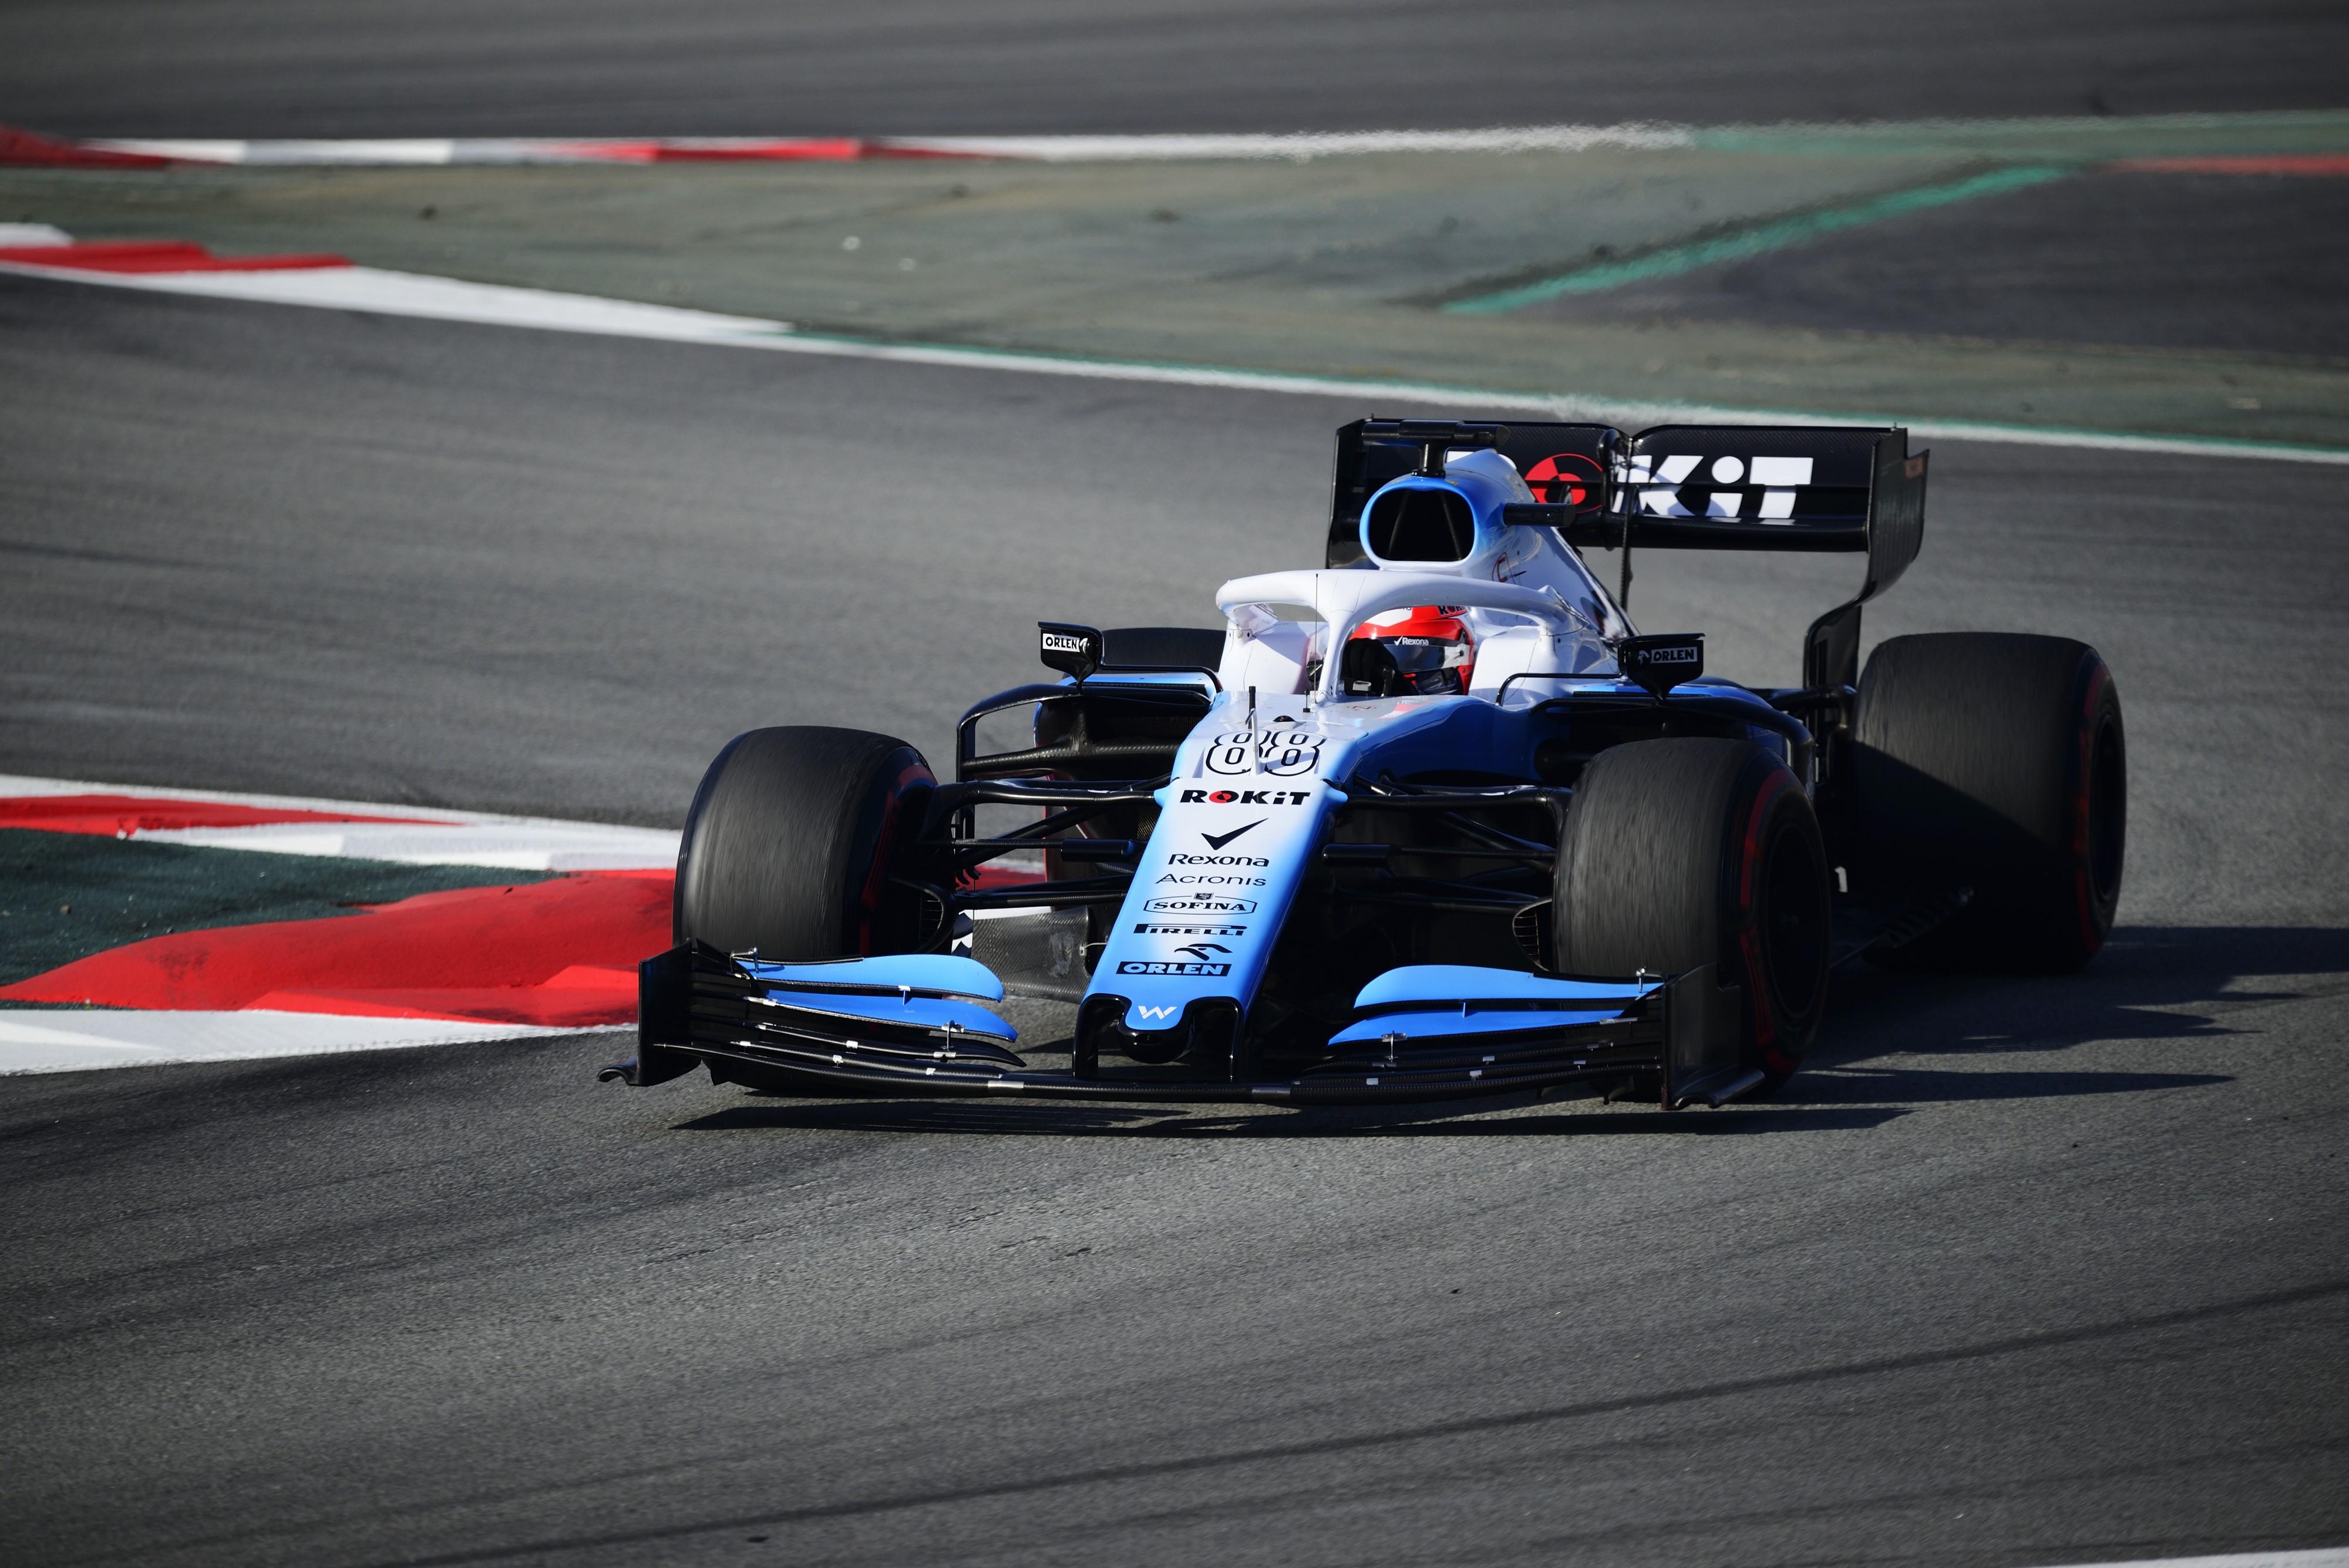 Robert Kubica (Williams) - Tests 2 Montmelo 2019